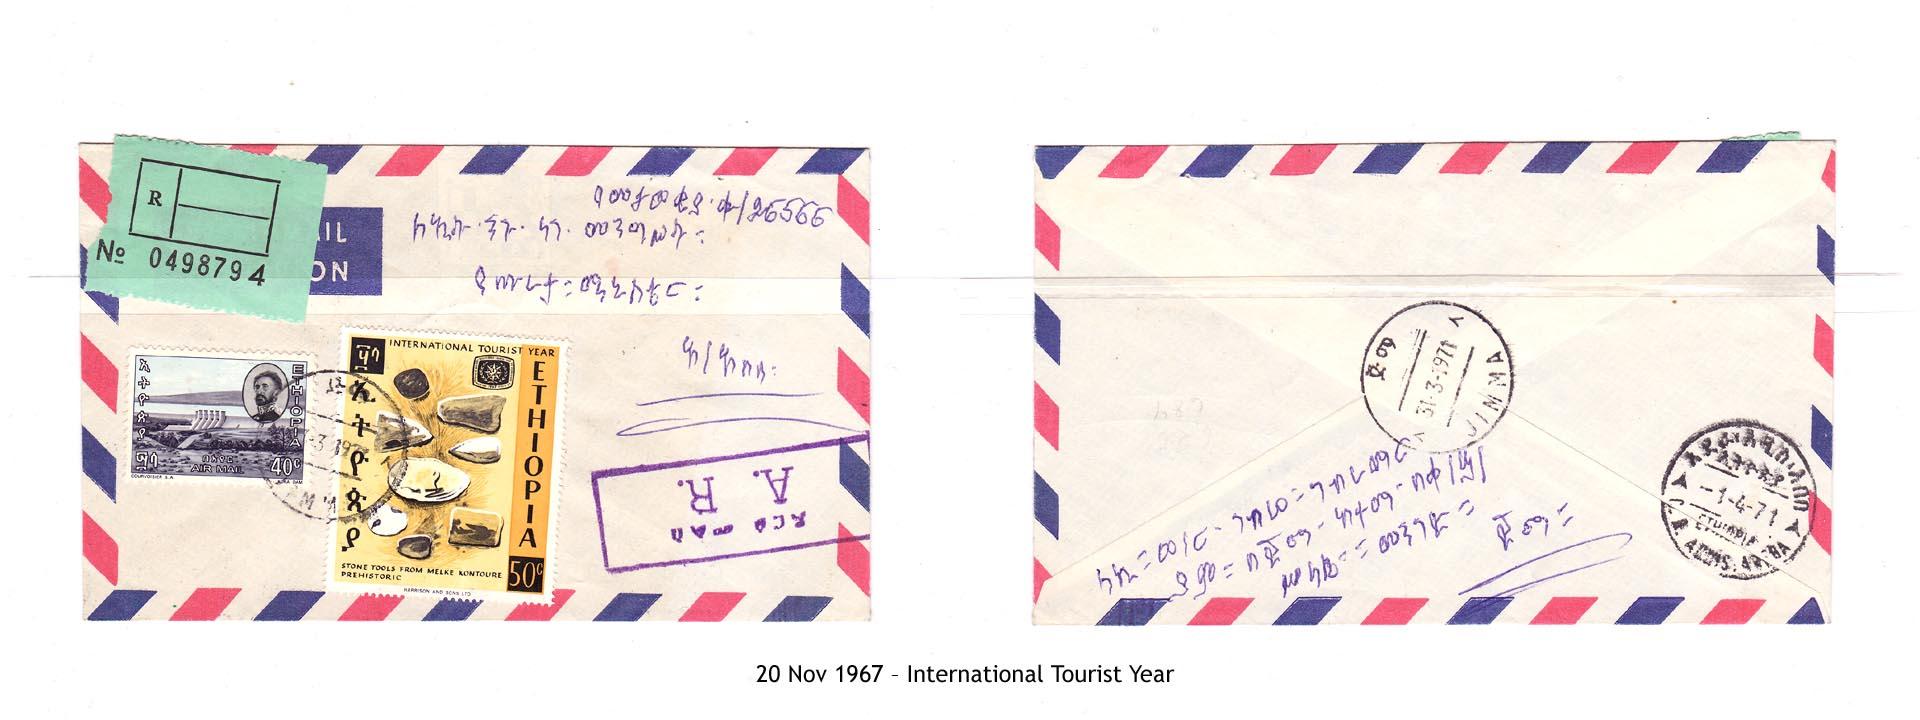 19671120 – International Tourist Year